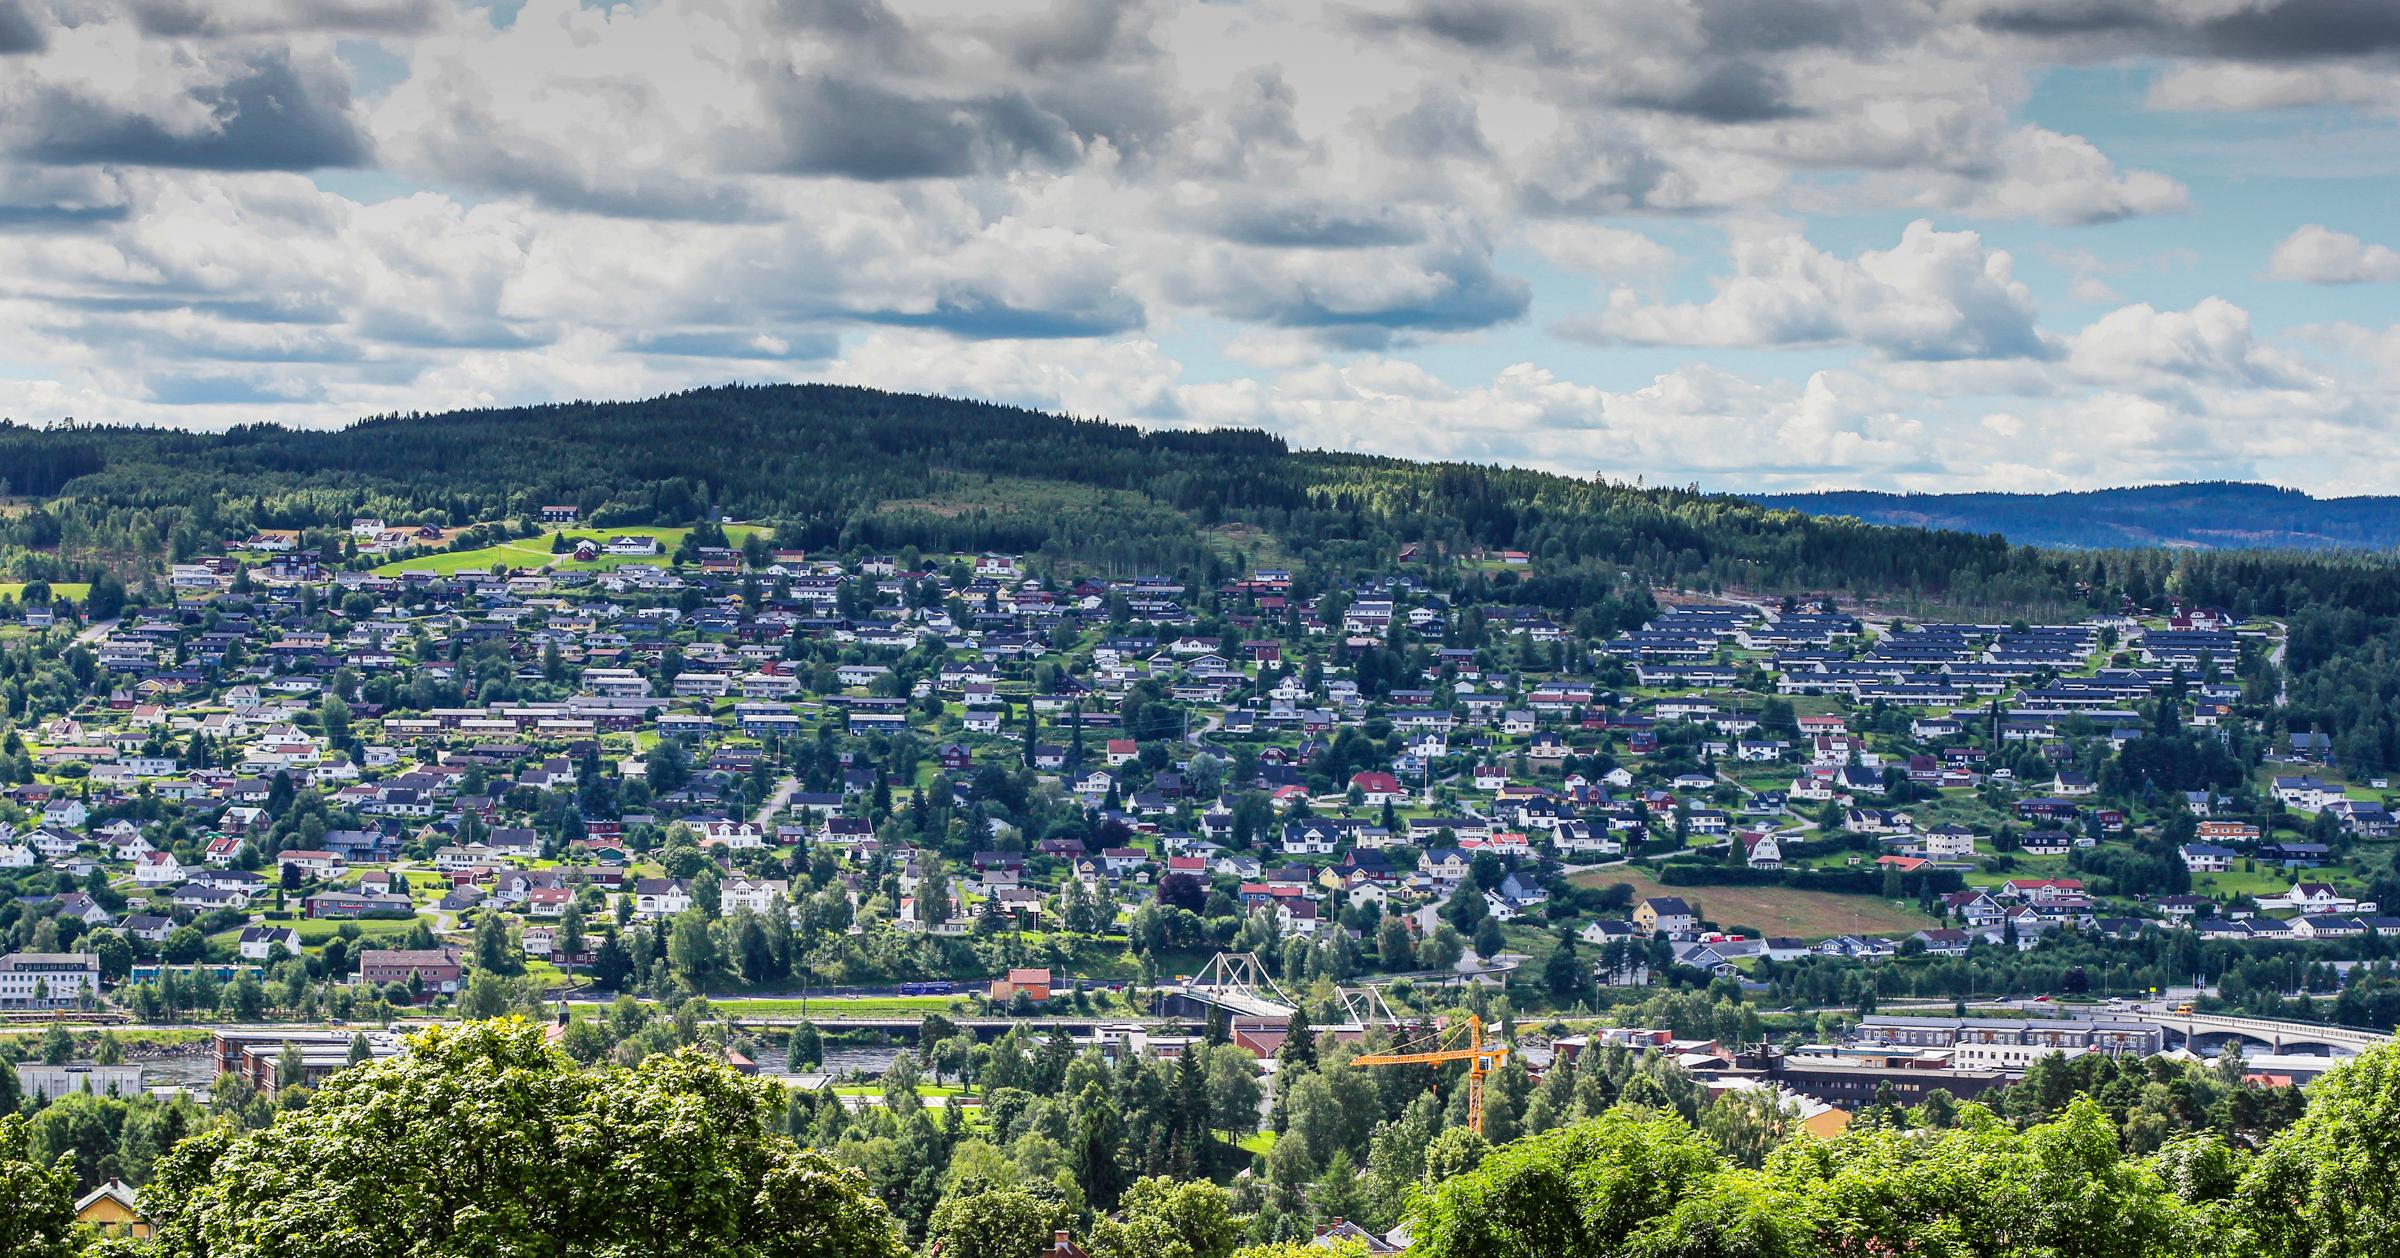 Kongsvinger. Foto: Kasanea / Adobe Stock